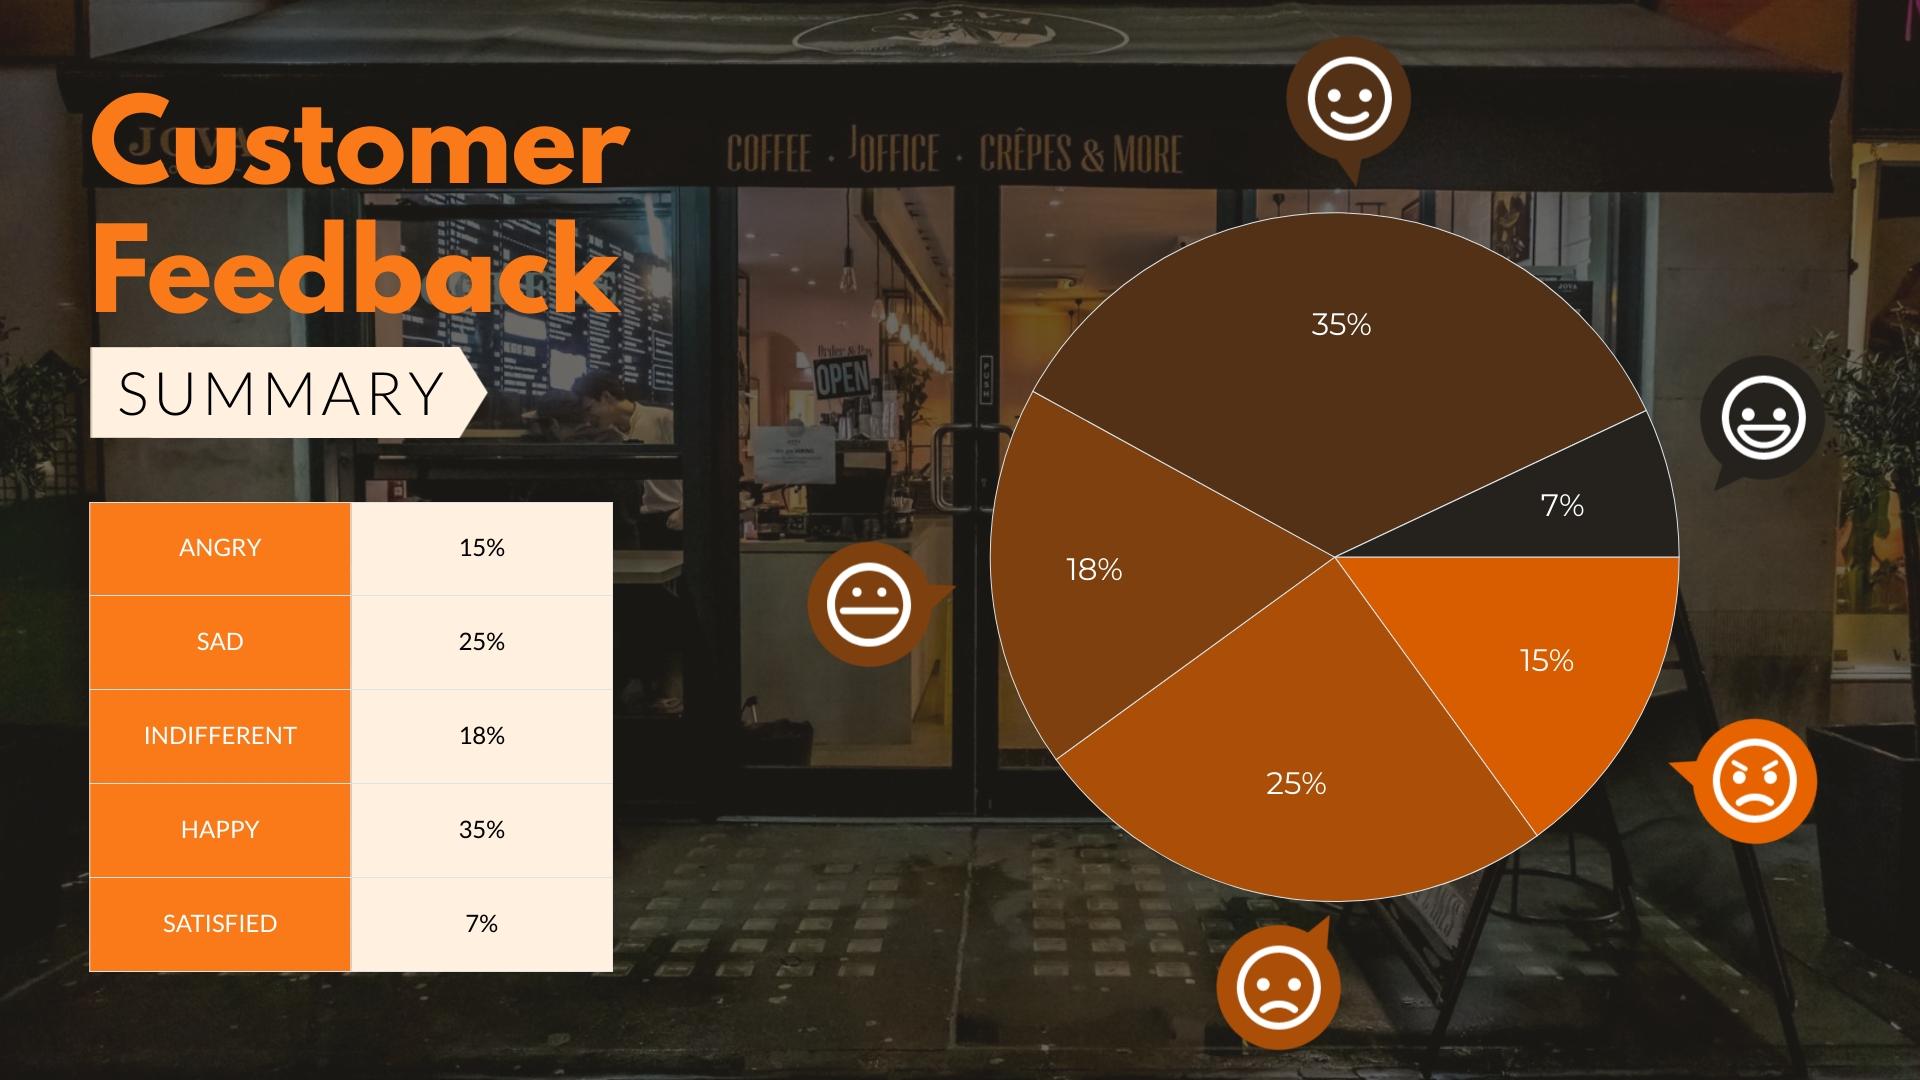 Customer Feedback Summary Pie Chart Template